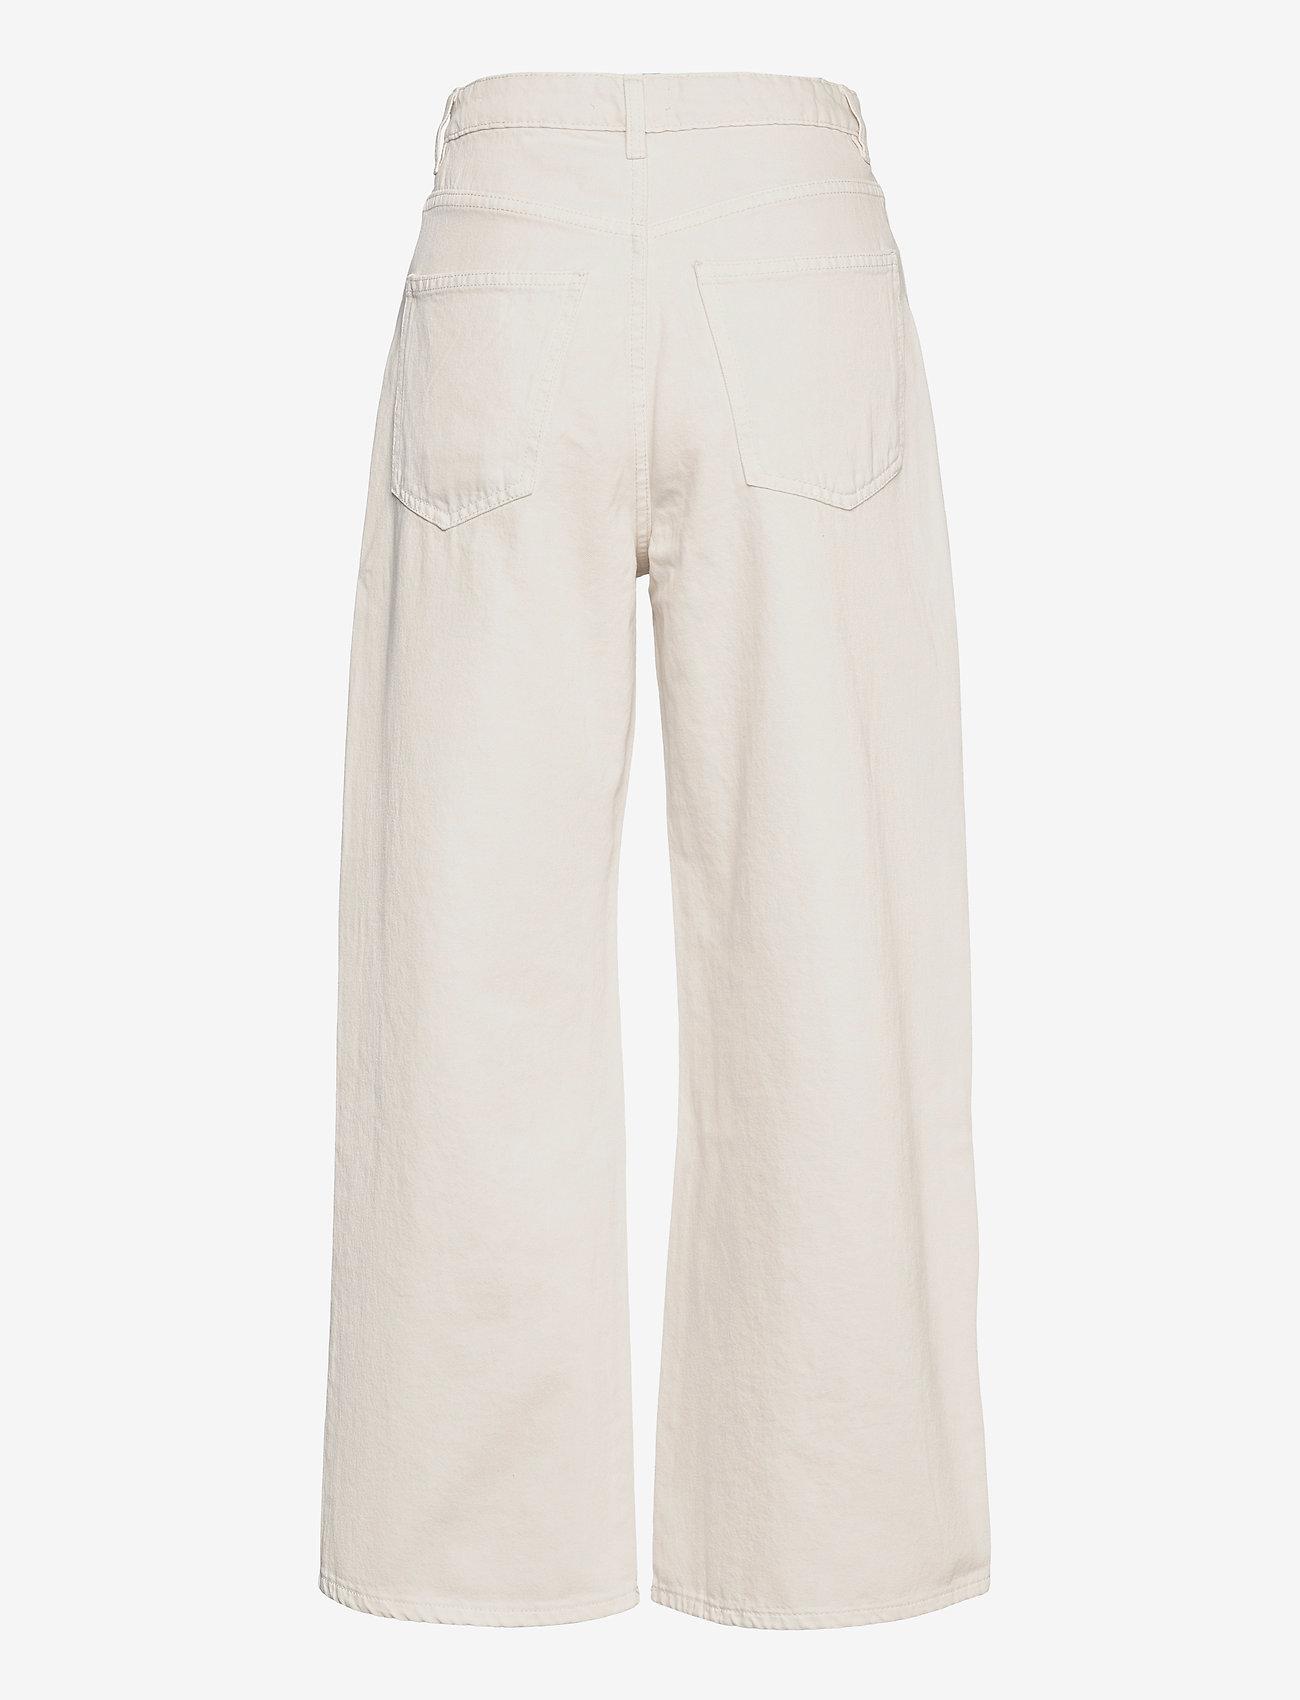 Gina Tricot - Idun crop wide jeans - bukser med brede ben - antique white (1066) - 1